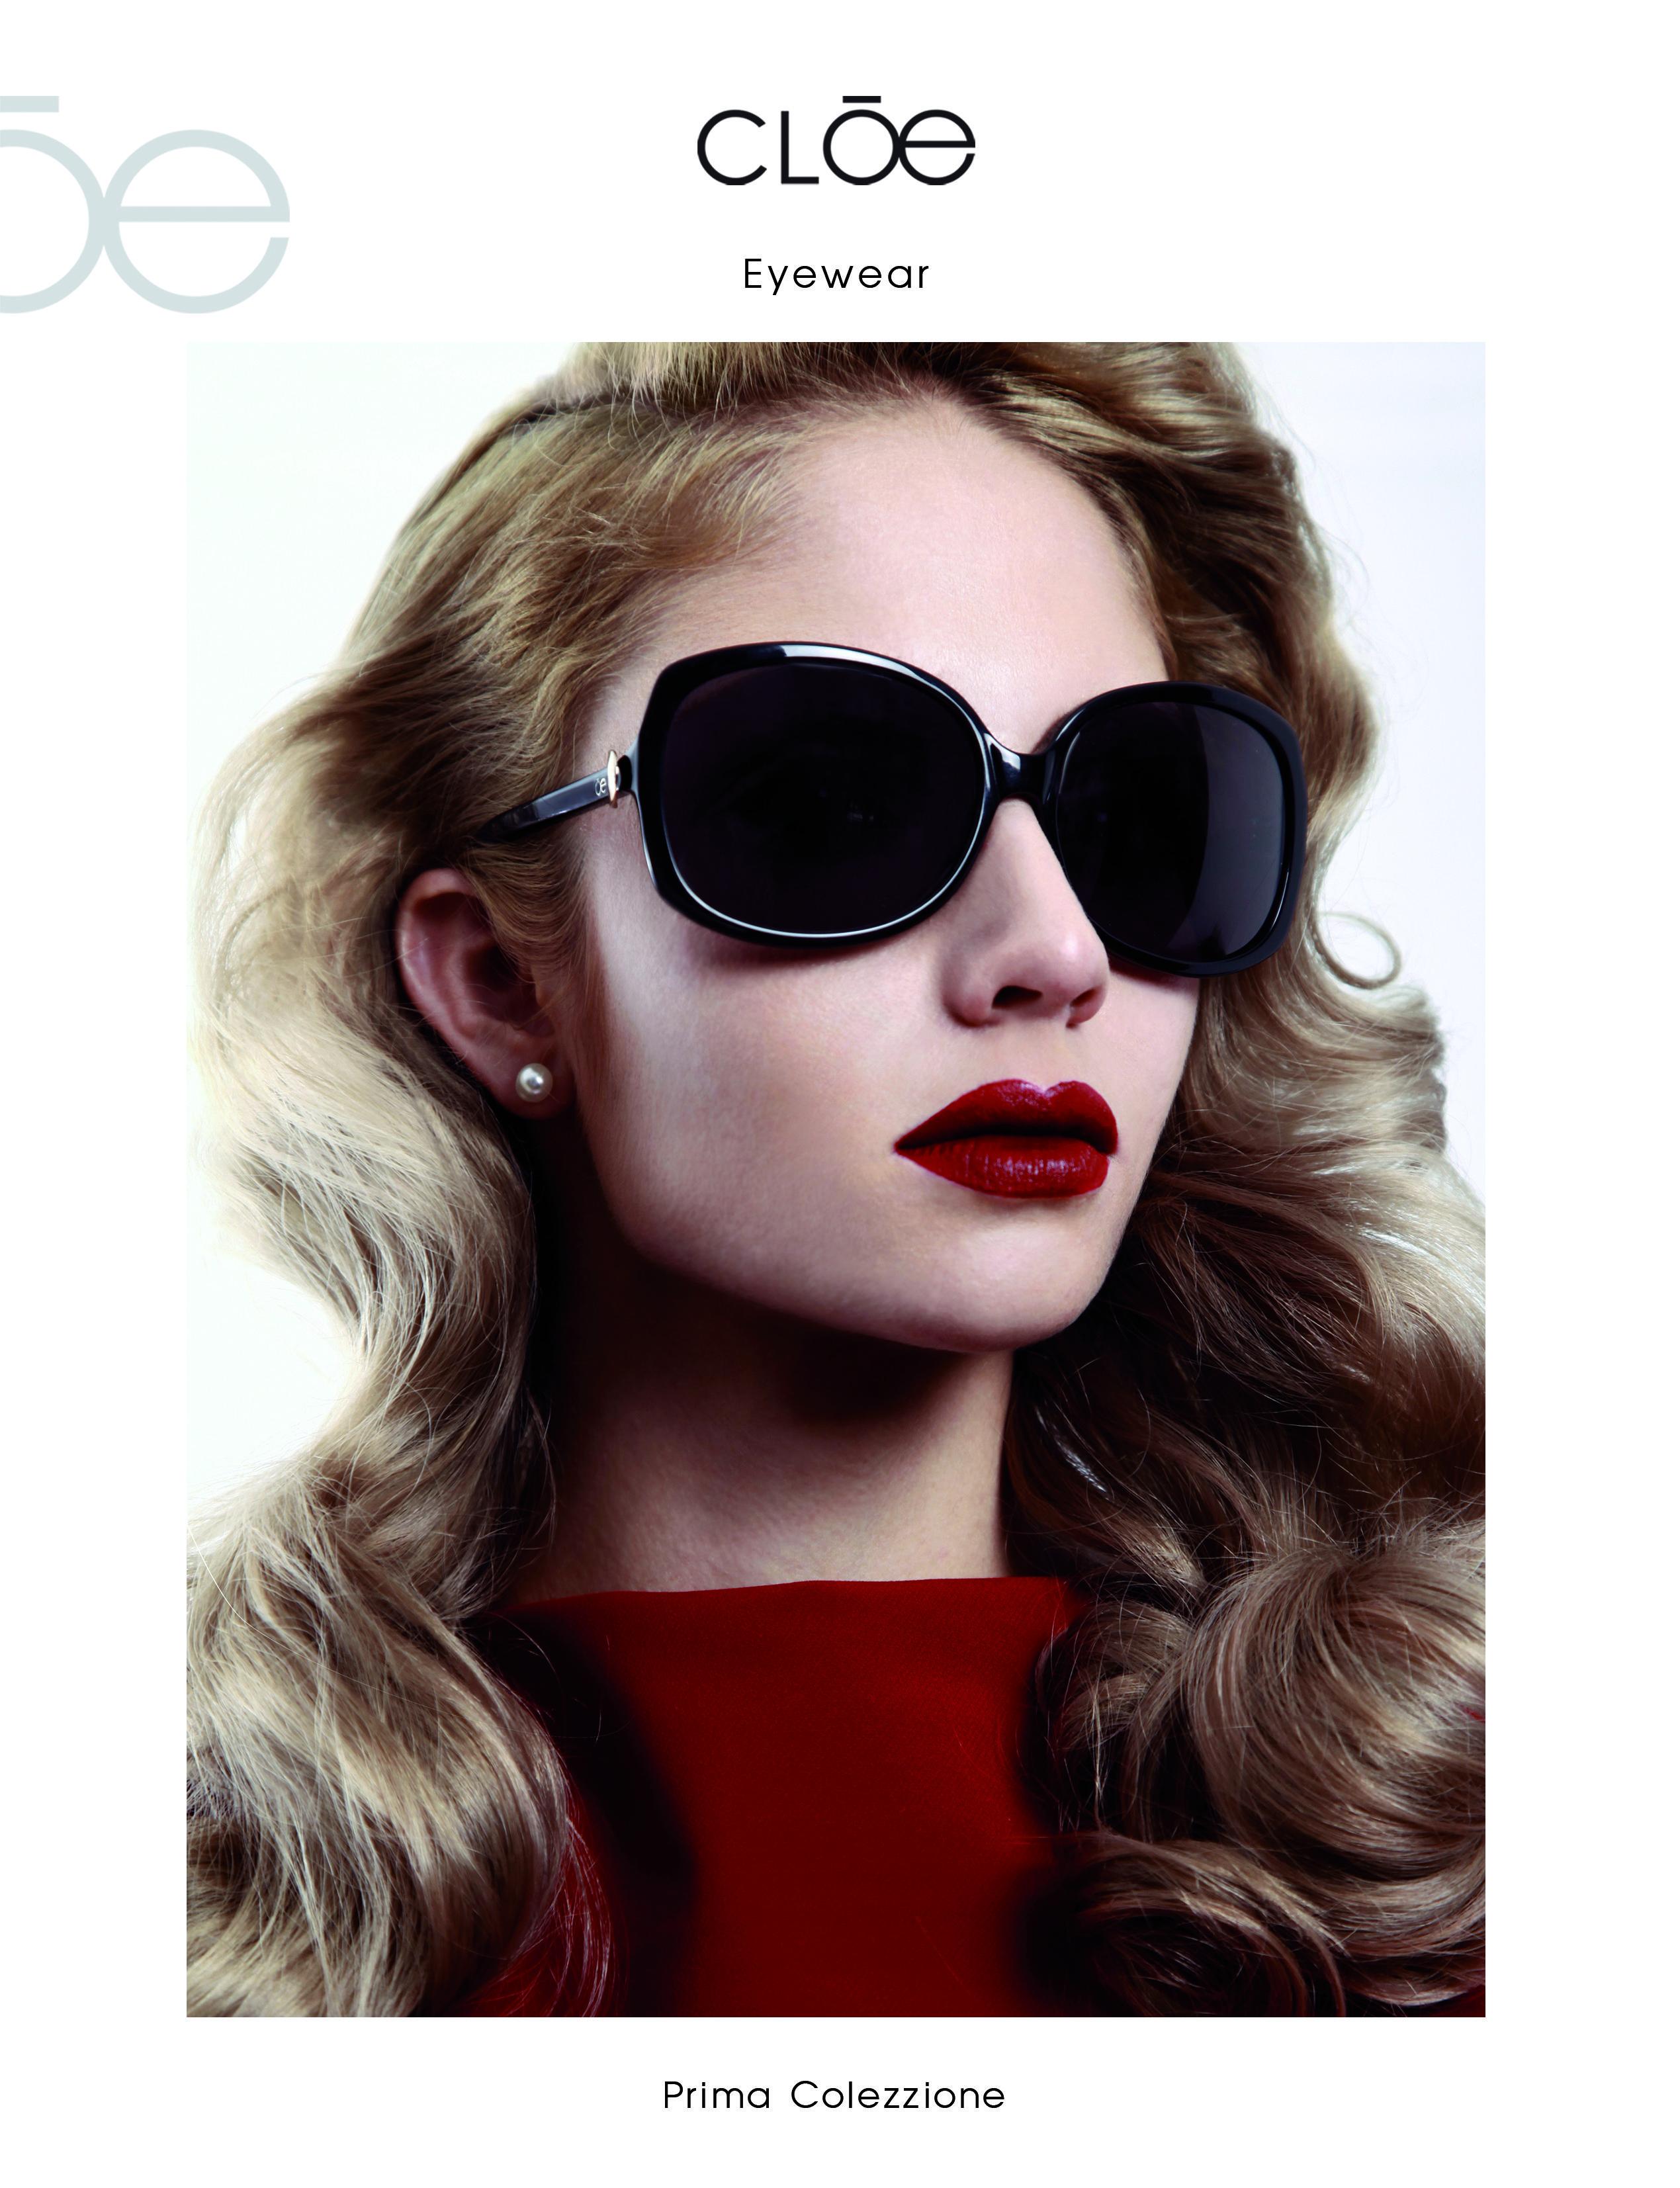 Oe eyewear-lentes   The Art of Eyewear   Eyewear, Sunglasses, Shades db279da29bce